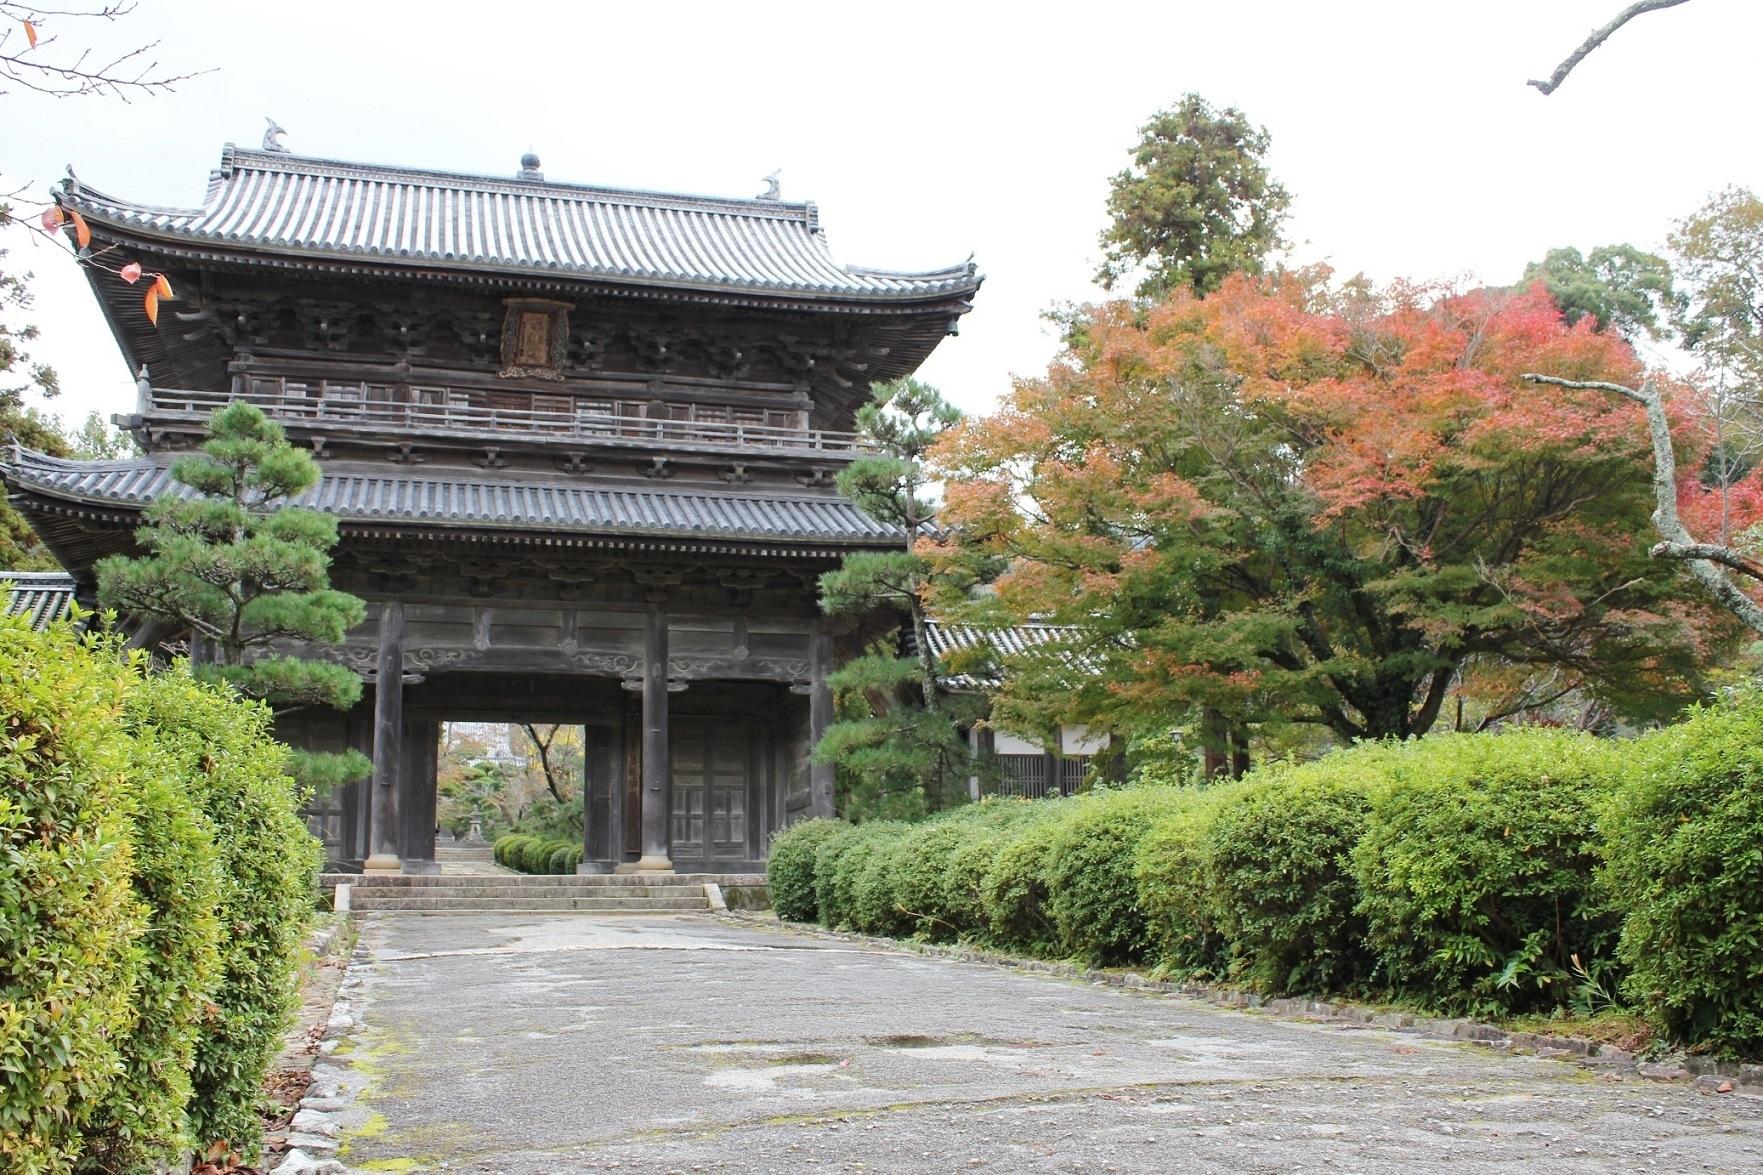 6. Tokoji Temple